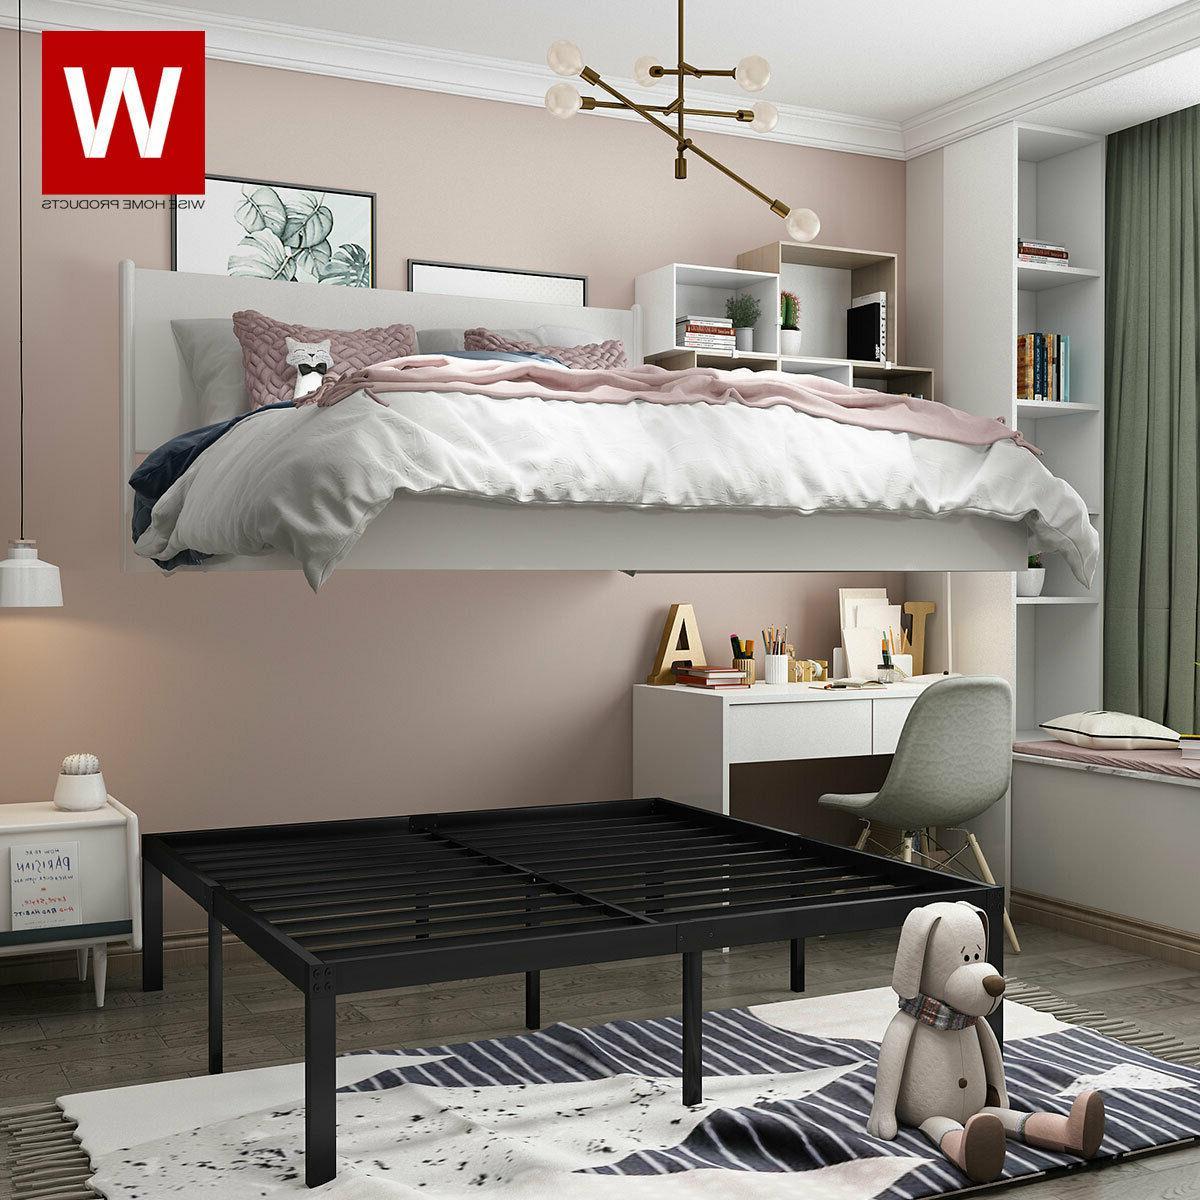 Queen Steel Bed Frame Metal Platform Beds with Heavy Duty St